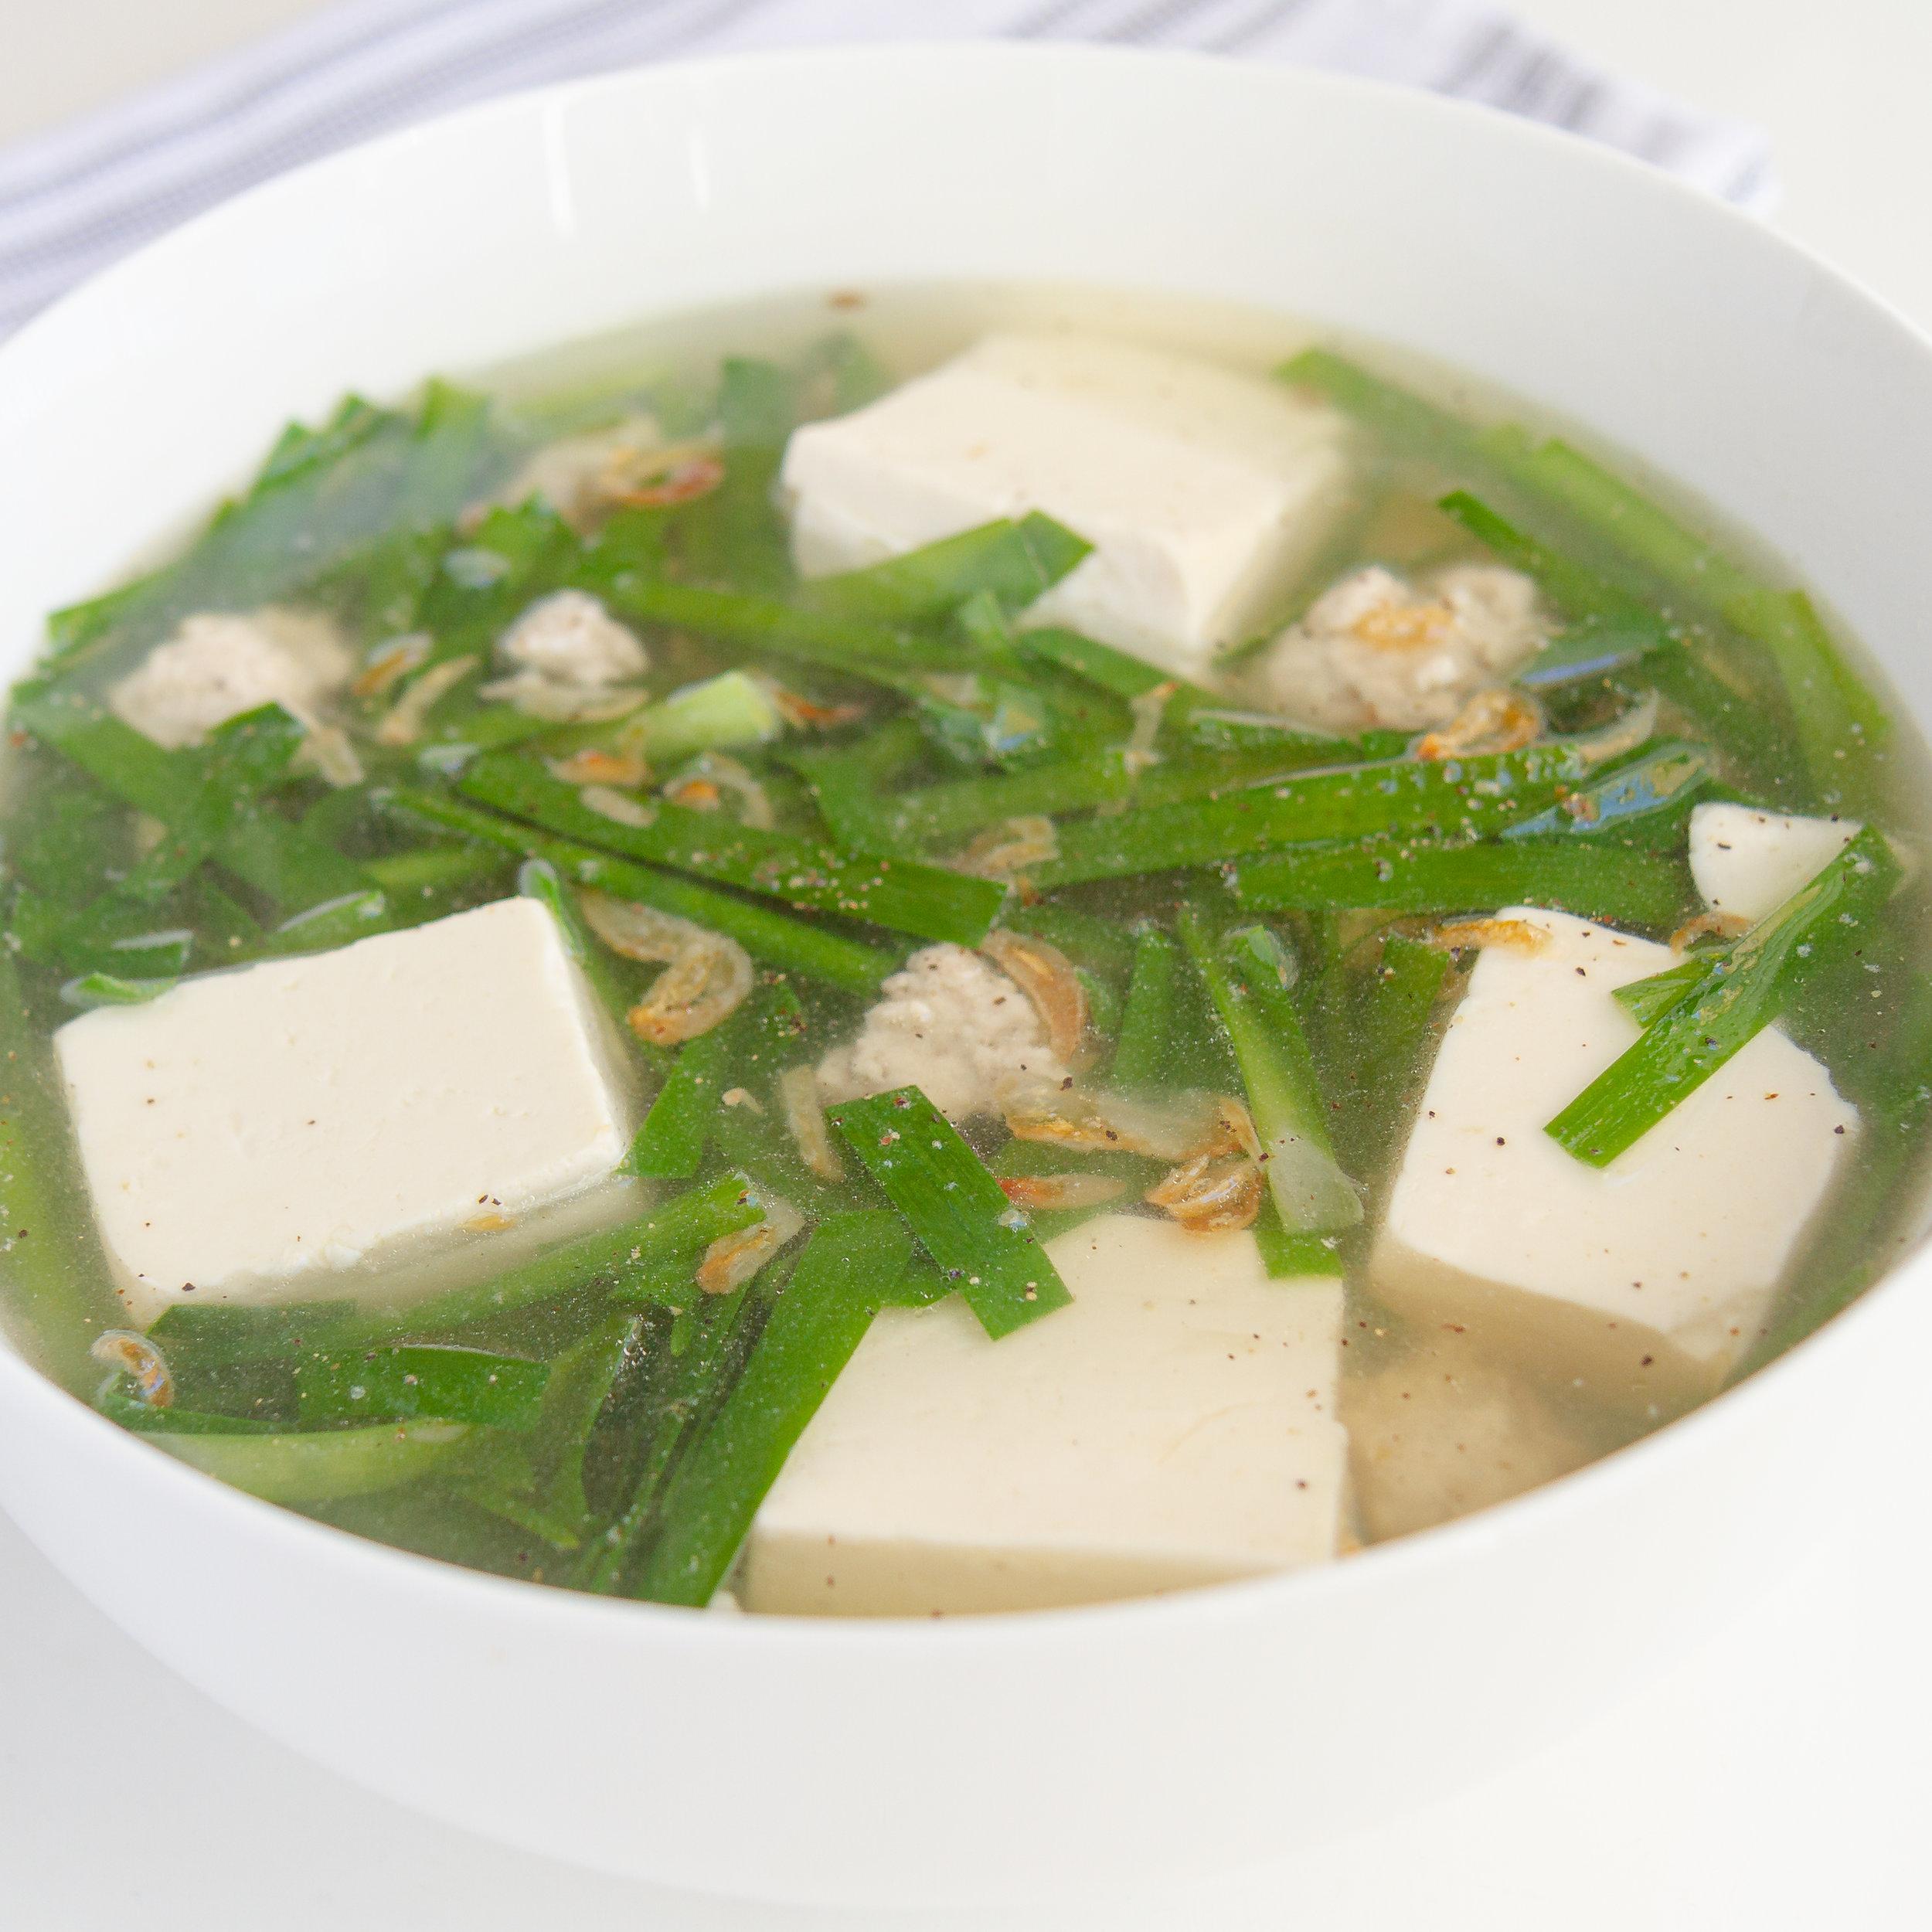 Vietnamese Tofu and Garlic Chive Soup with Ground Pork (Canh Dau Hu He Nau Thit Bam)